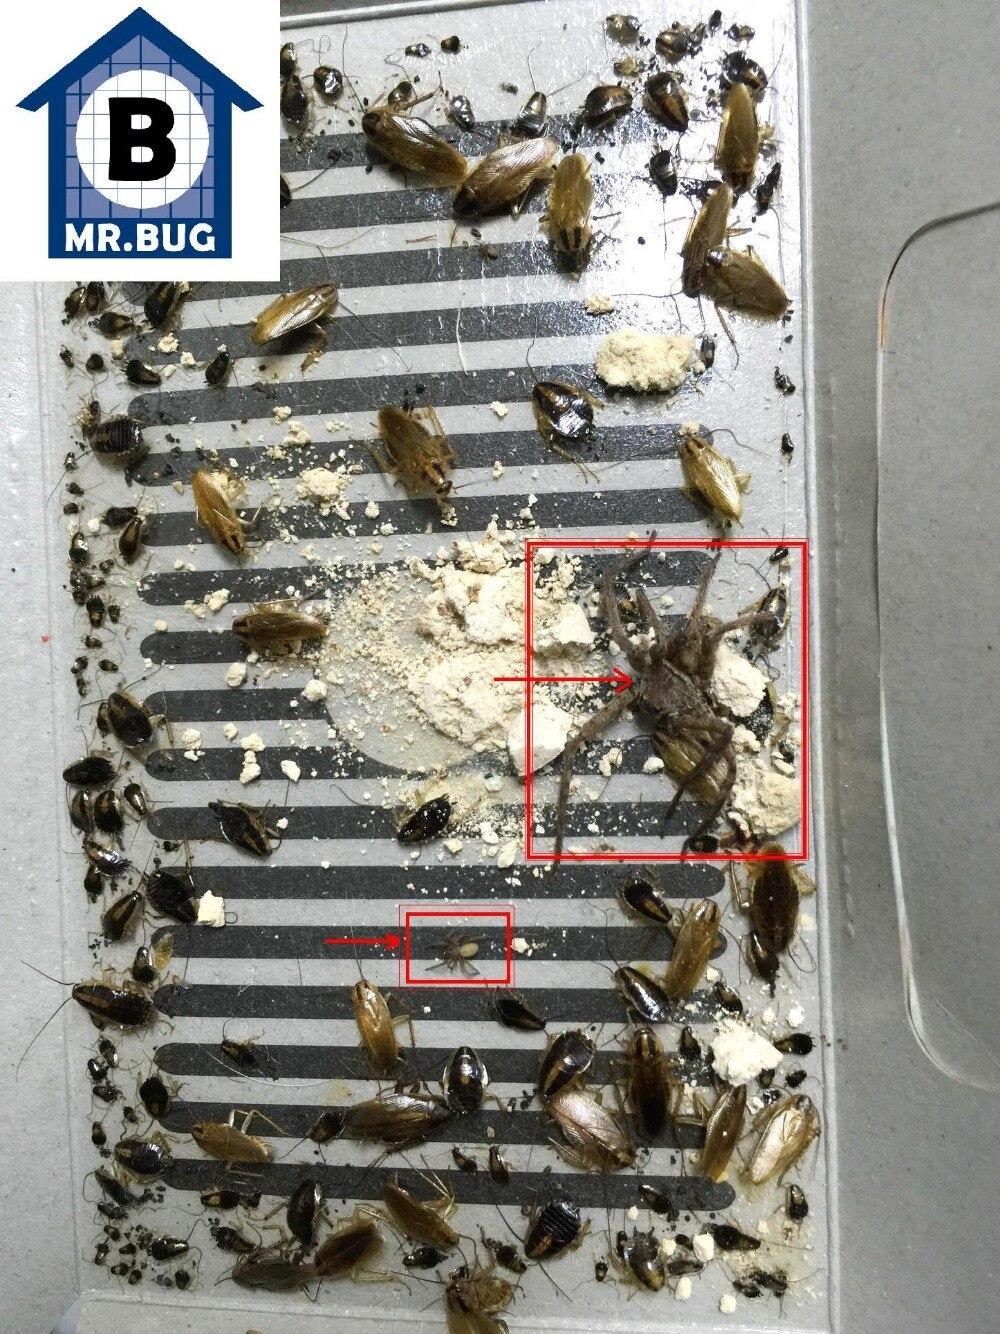 2018 New ECO Mr Bug cockroach control capture trapper, Home cockroaches trap roaches trapper, pest kill bait trap non-toxic! Щипцы